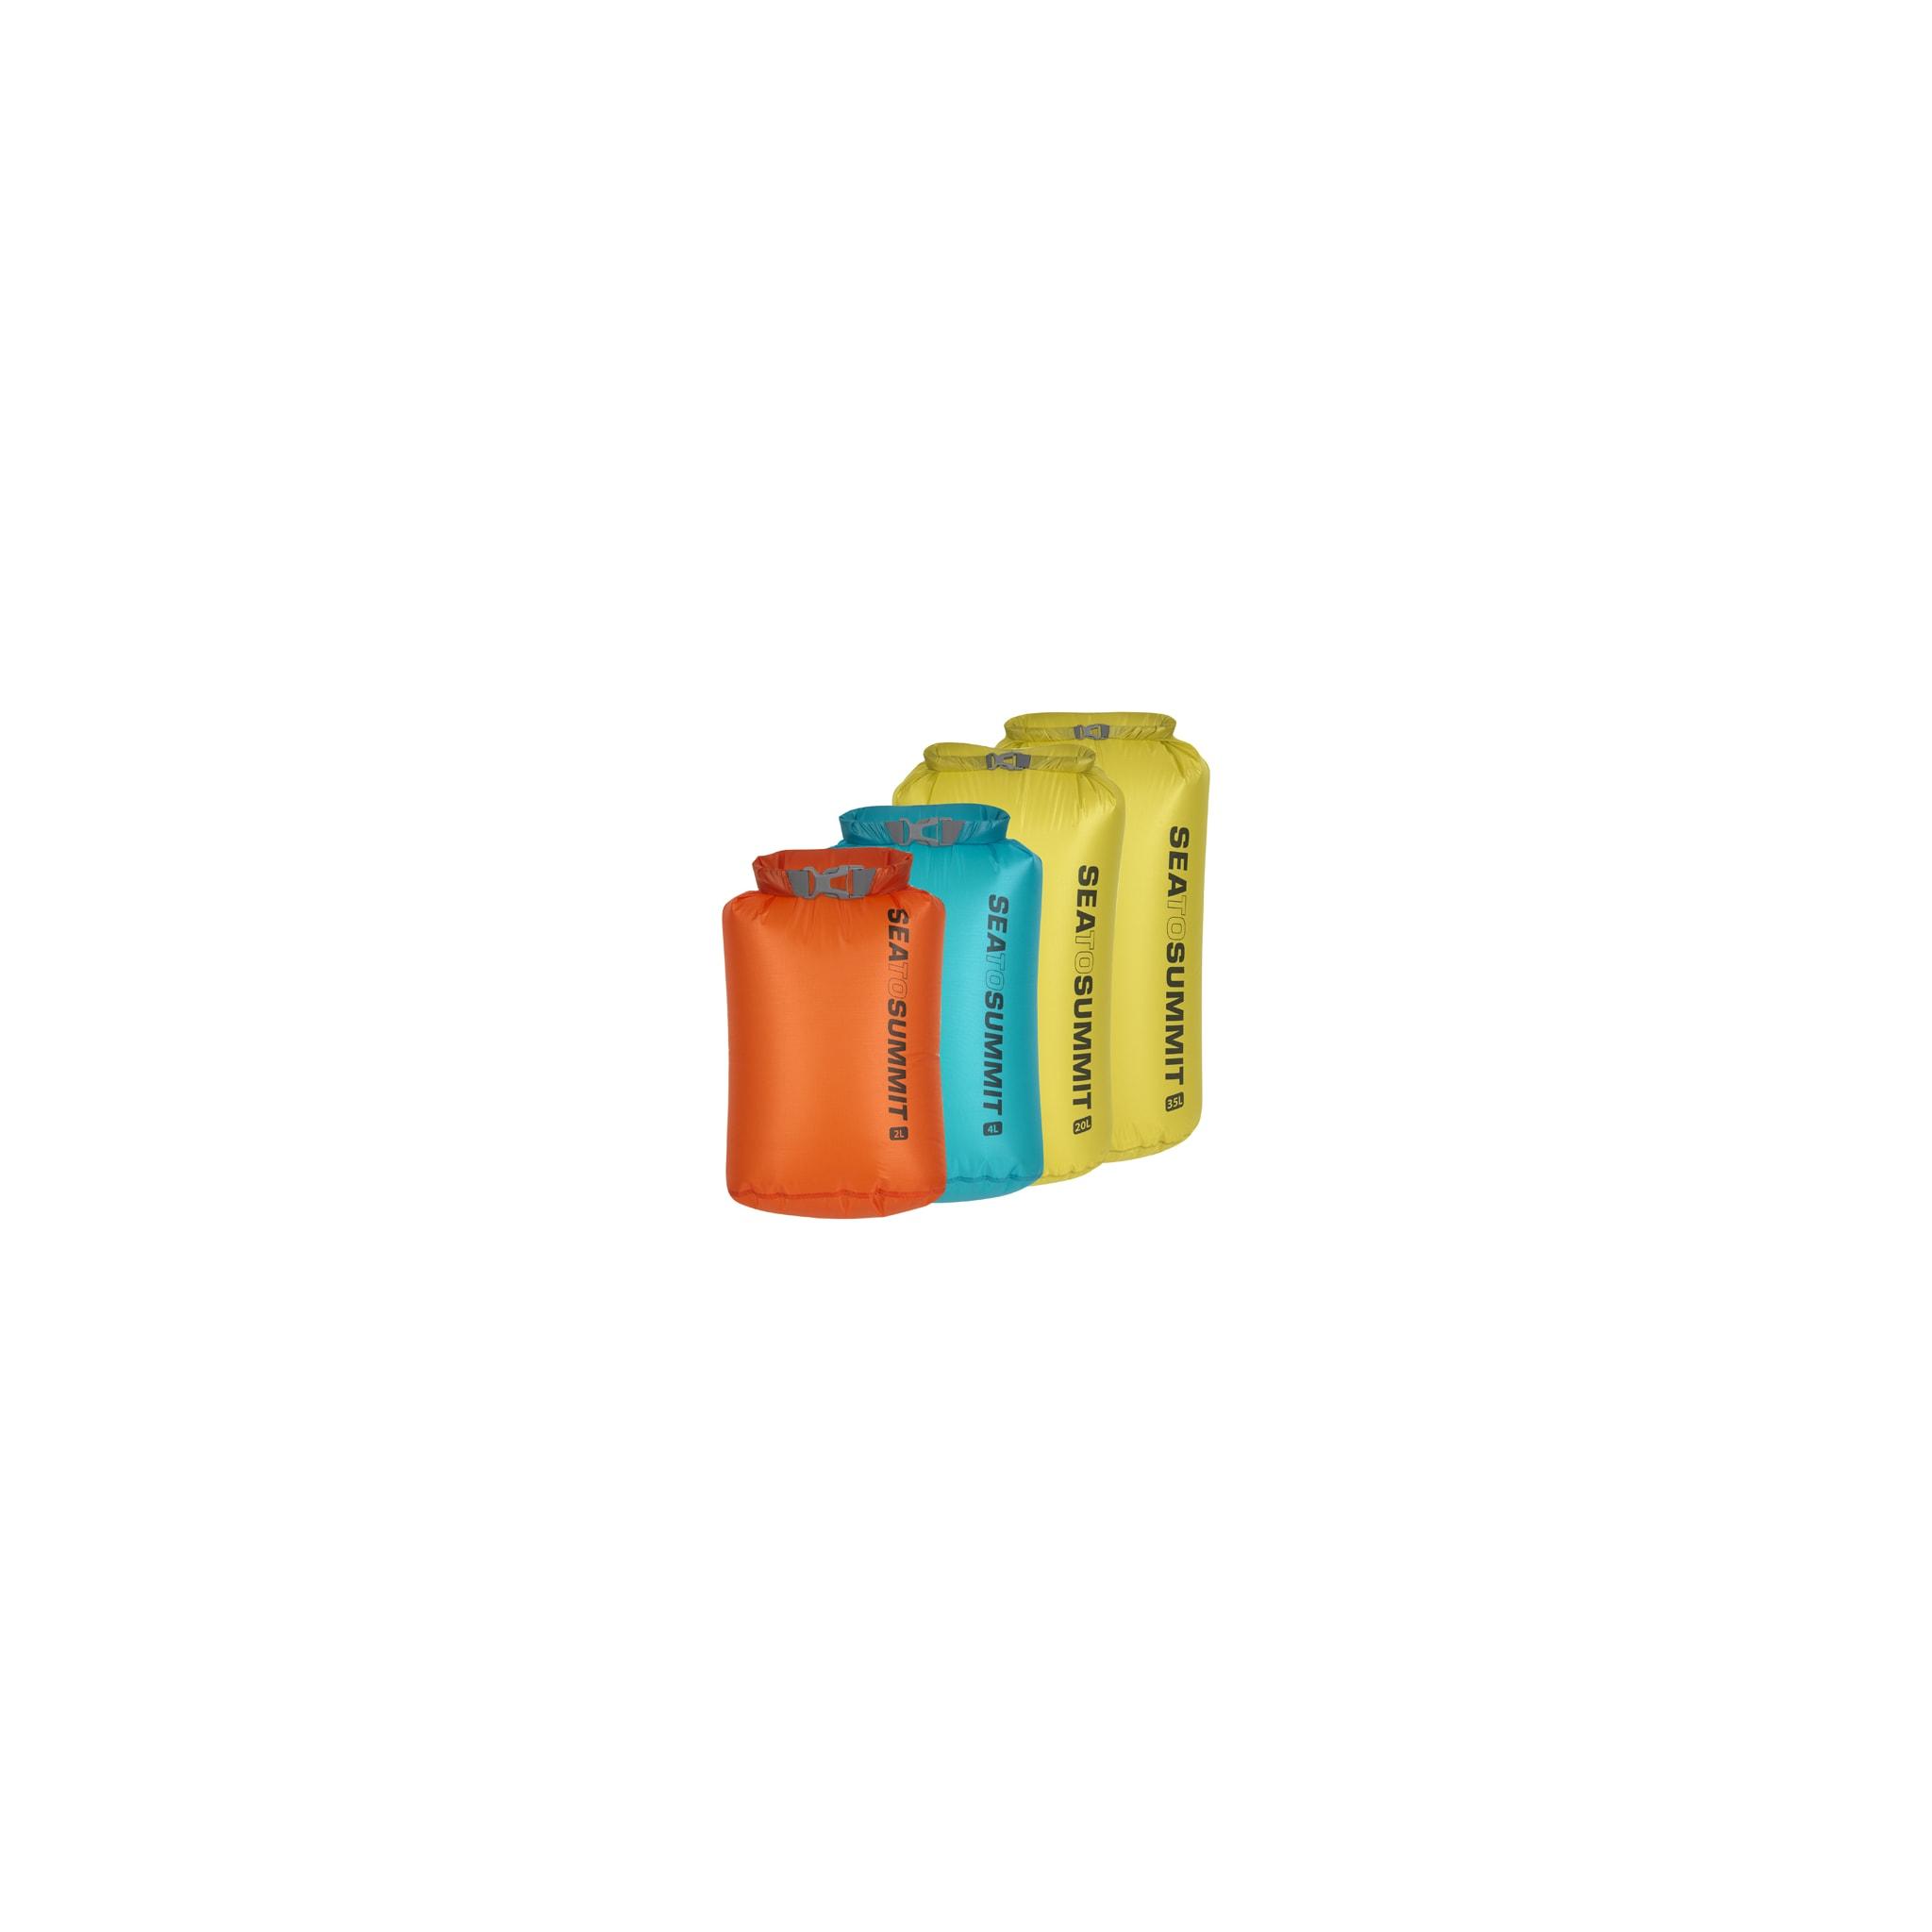 Superlette pakkposer fra 1 til 13 liter!